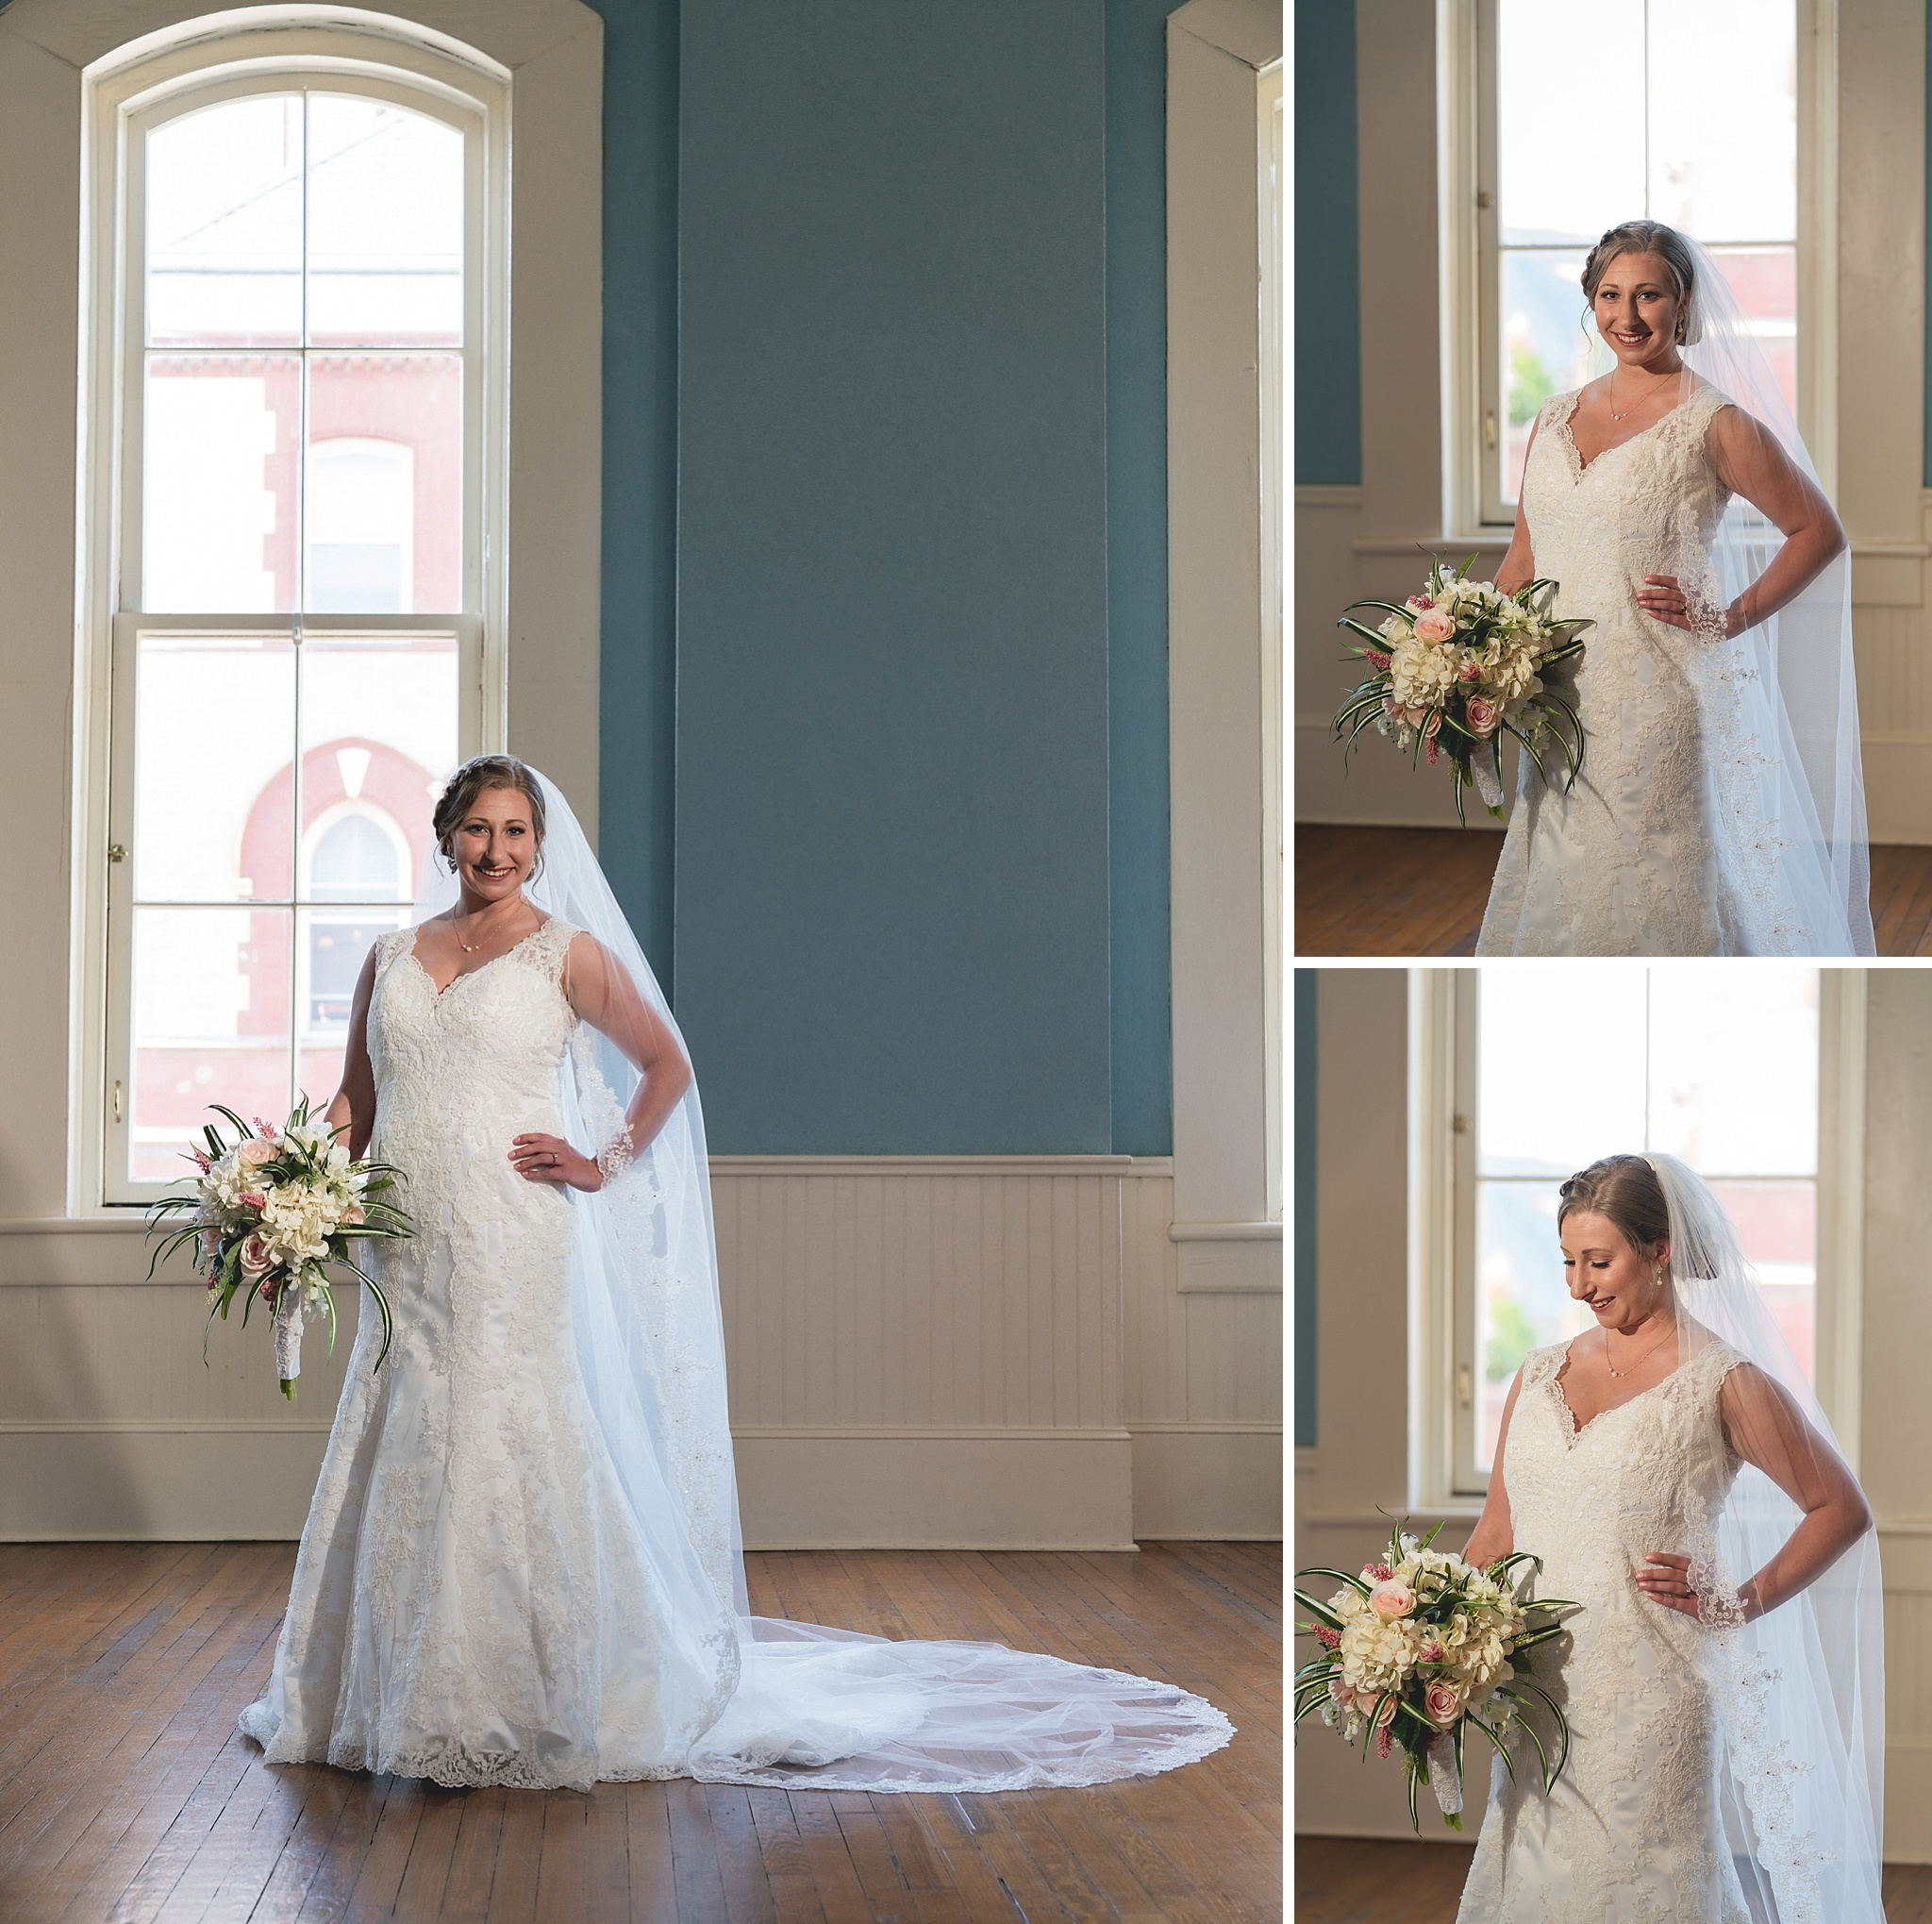 New-Bern-NC-Wedding-Photographer-051.jpg